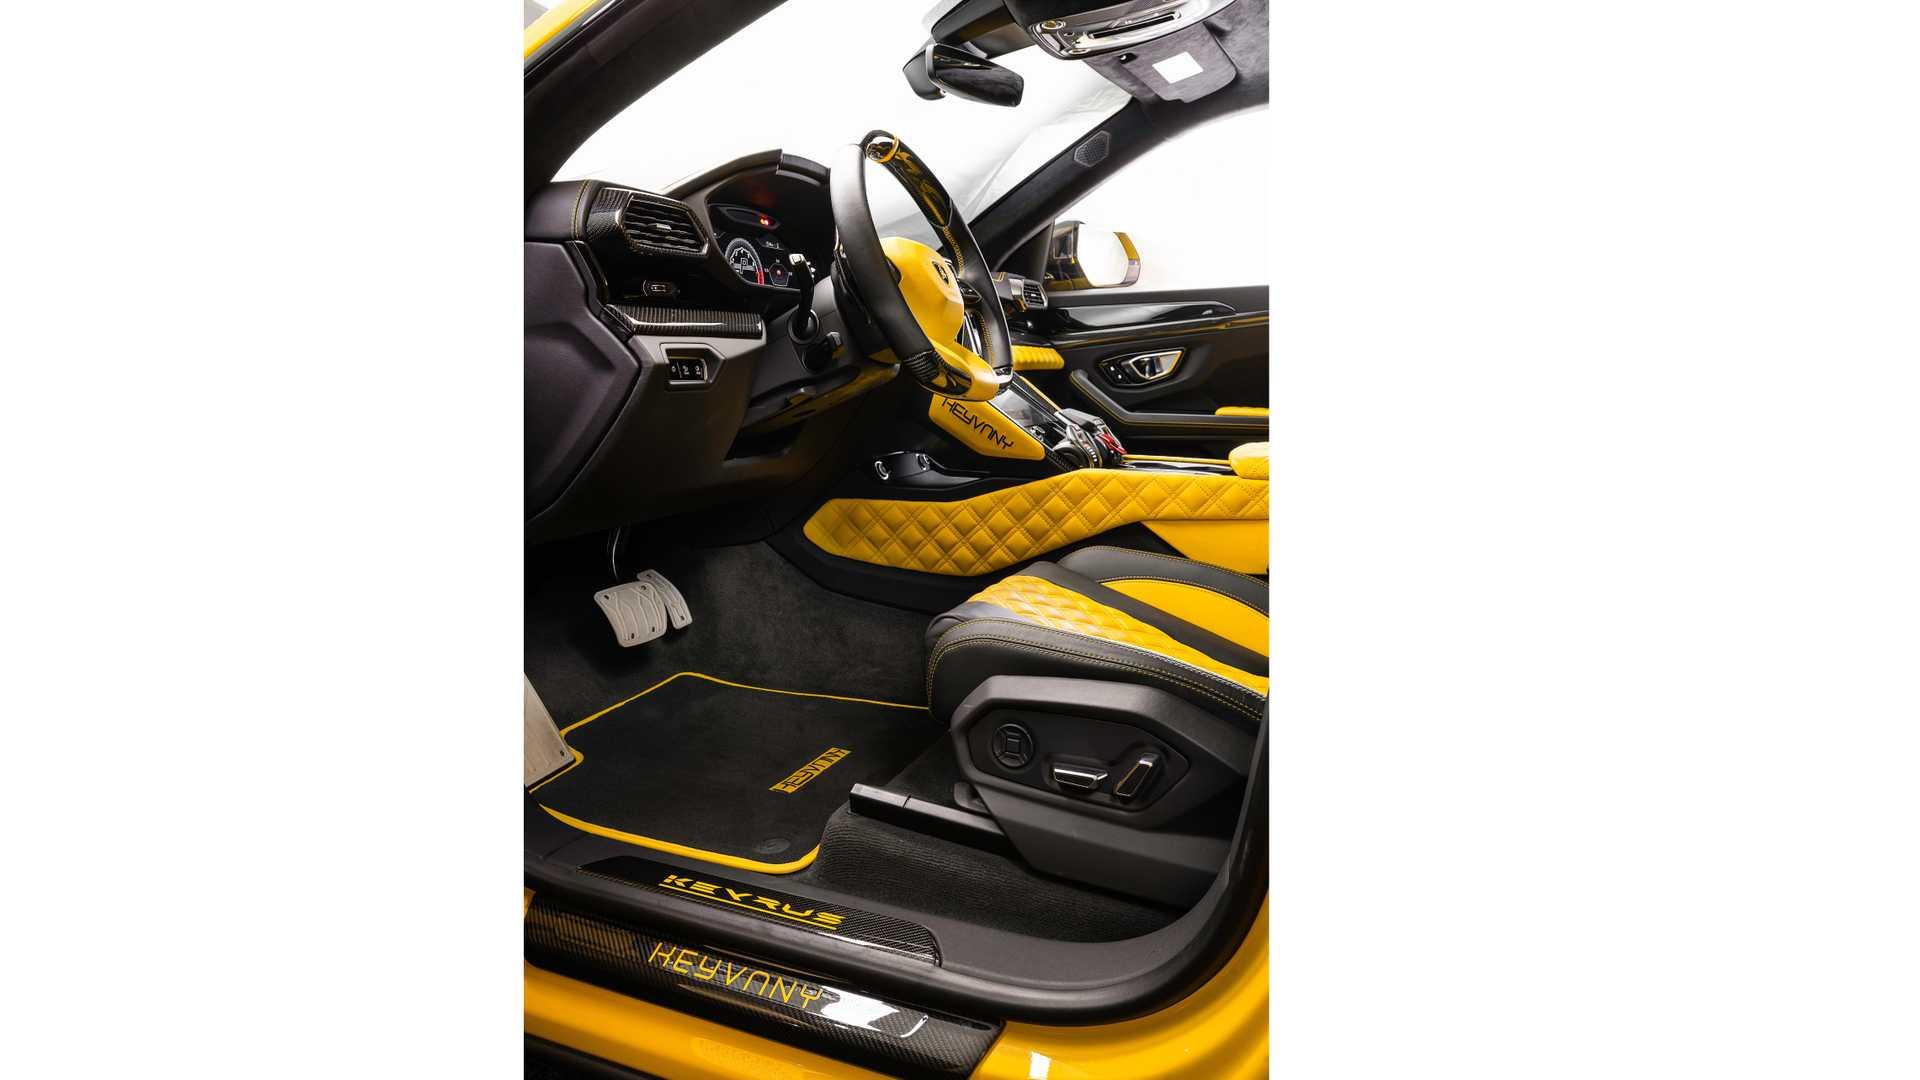 Lamborghini-Urus-by-Keyvany-21